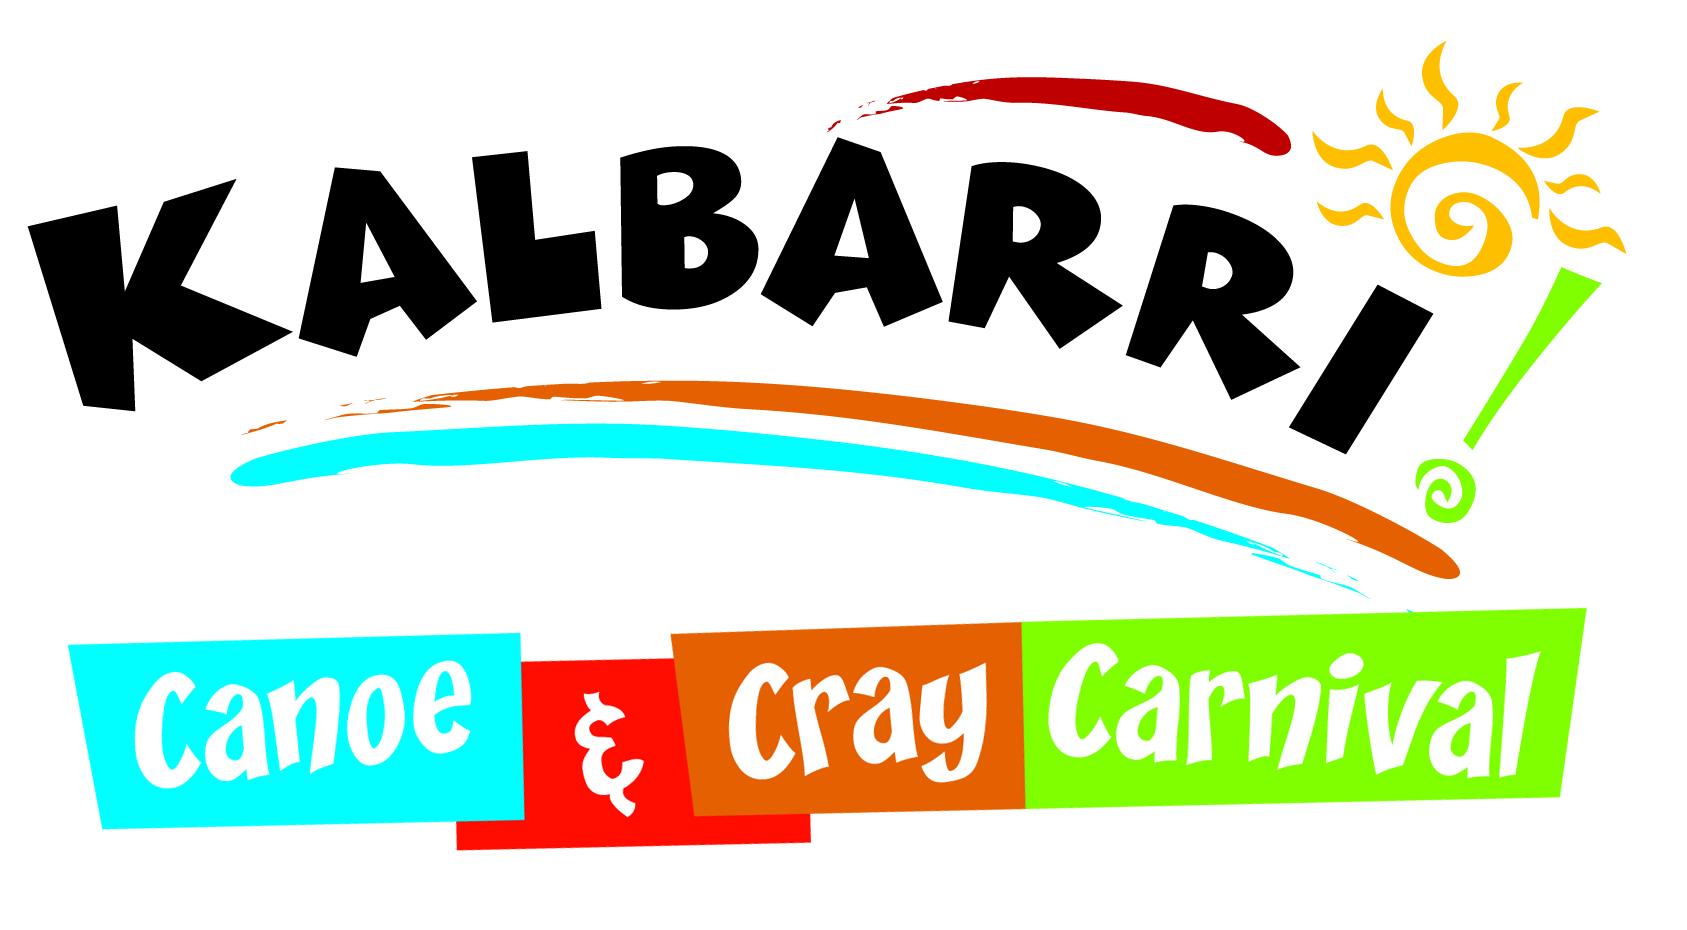 Canoe & Cray Carnival (Illustrator 8)